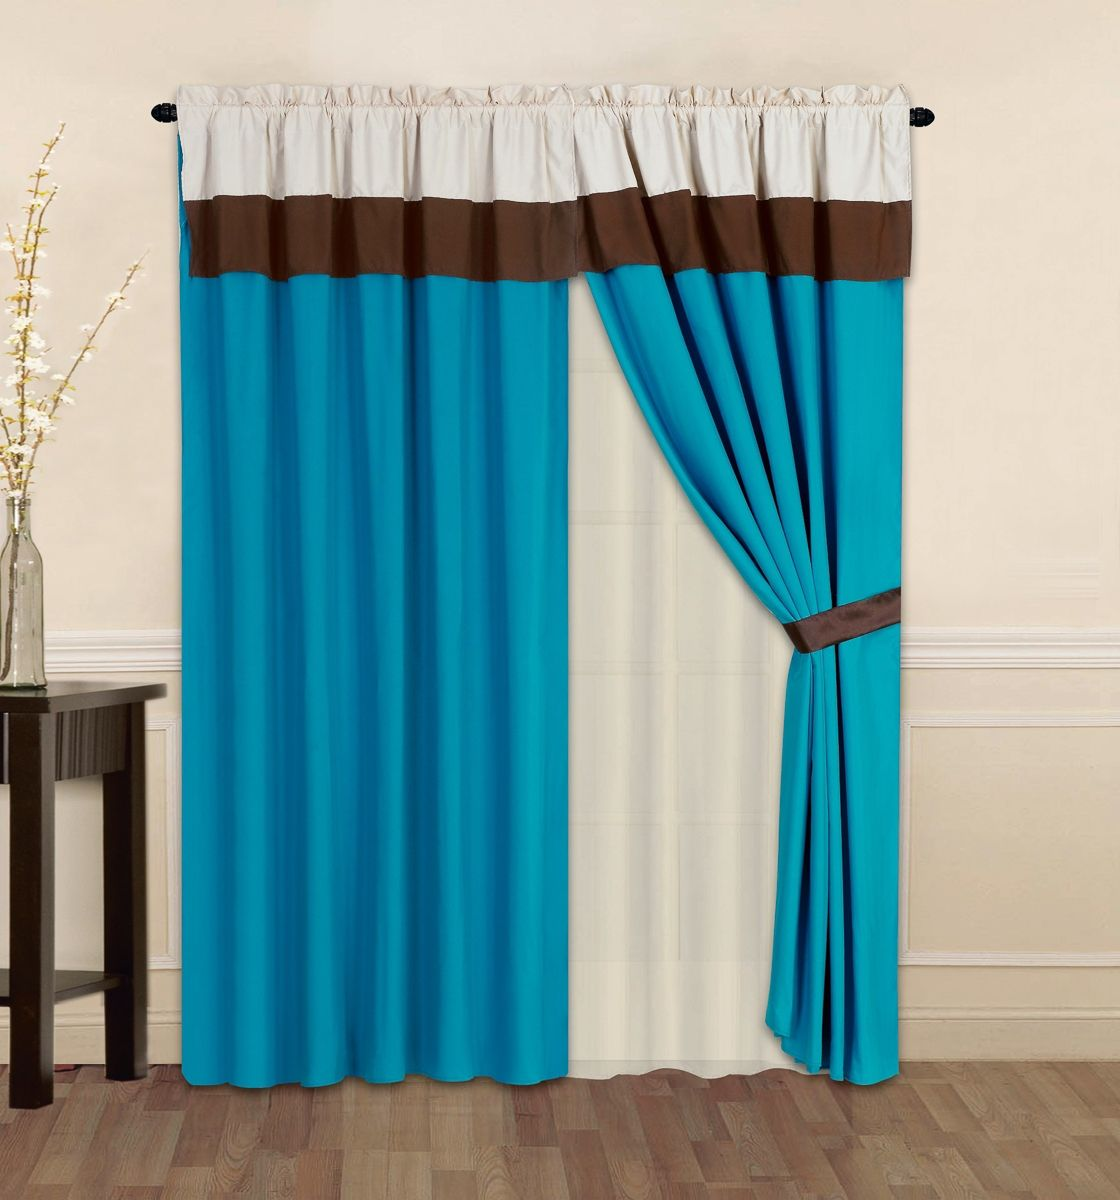 4 window curtain ideas   pc turquoise curtainset  blue curtains homefurnishing